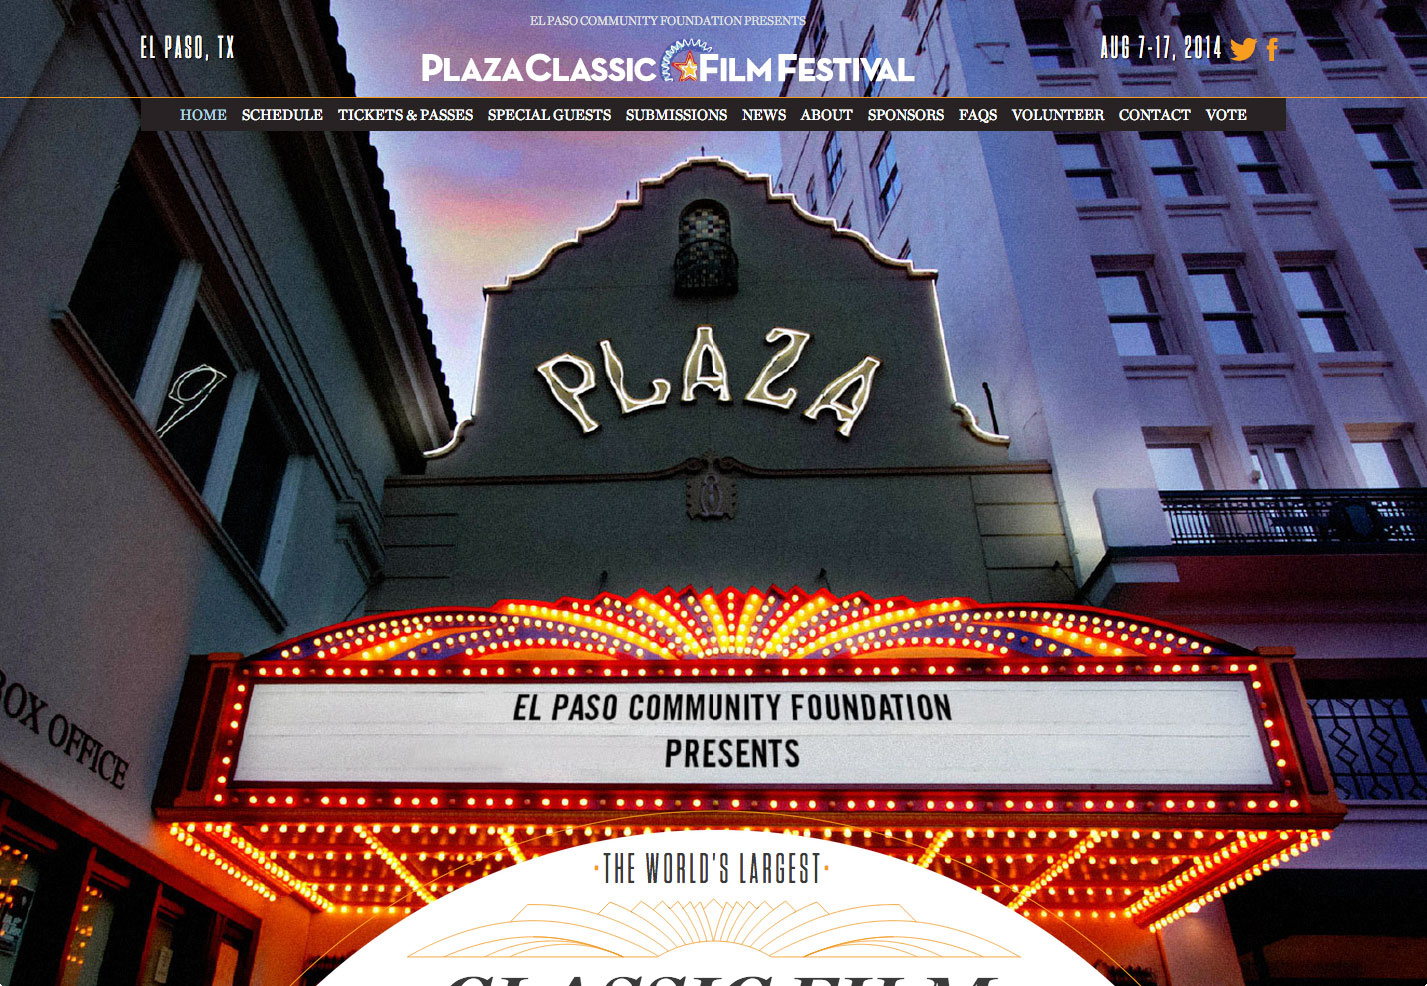 plaza festival de cine clásico